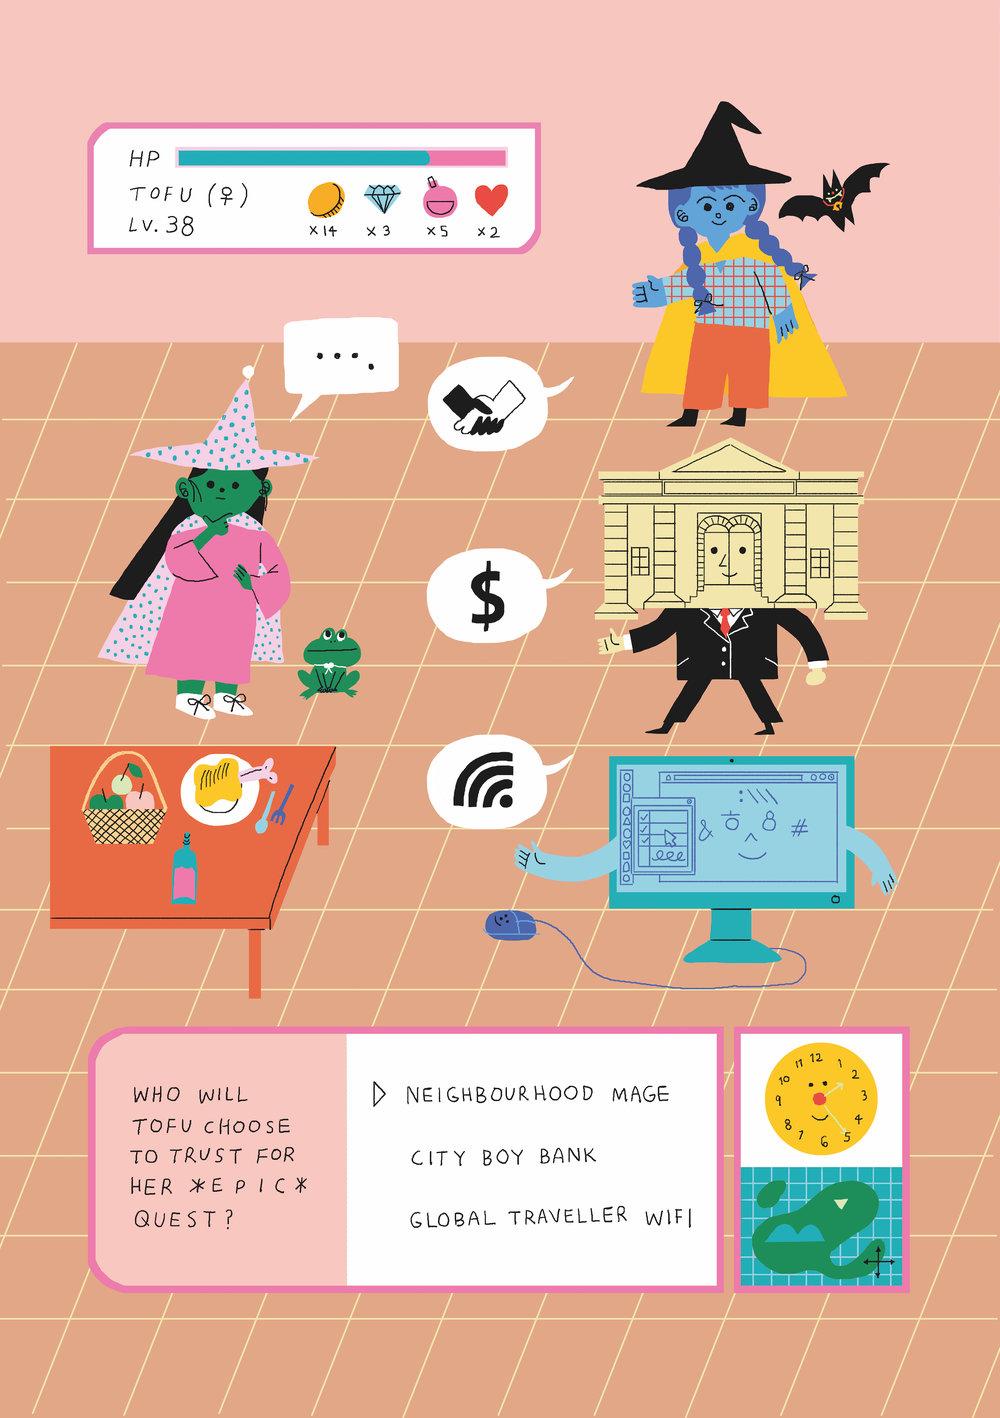 Illustration by Subin Yang.